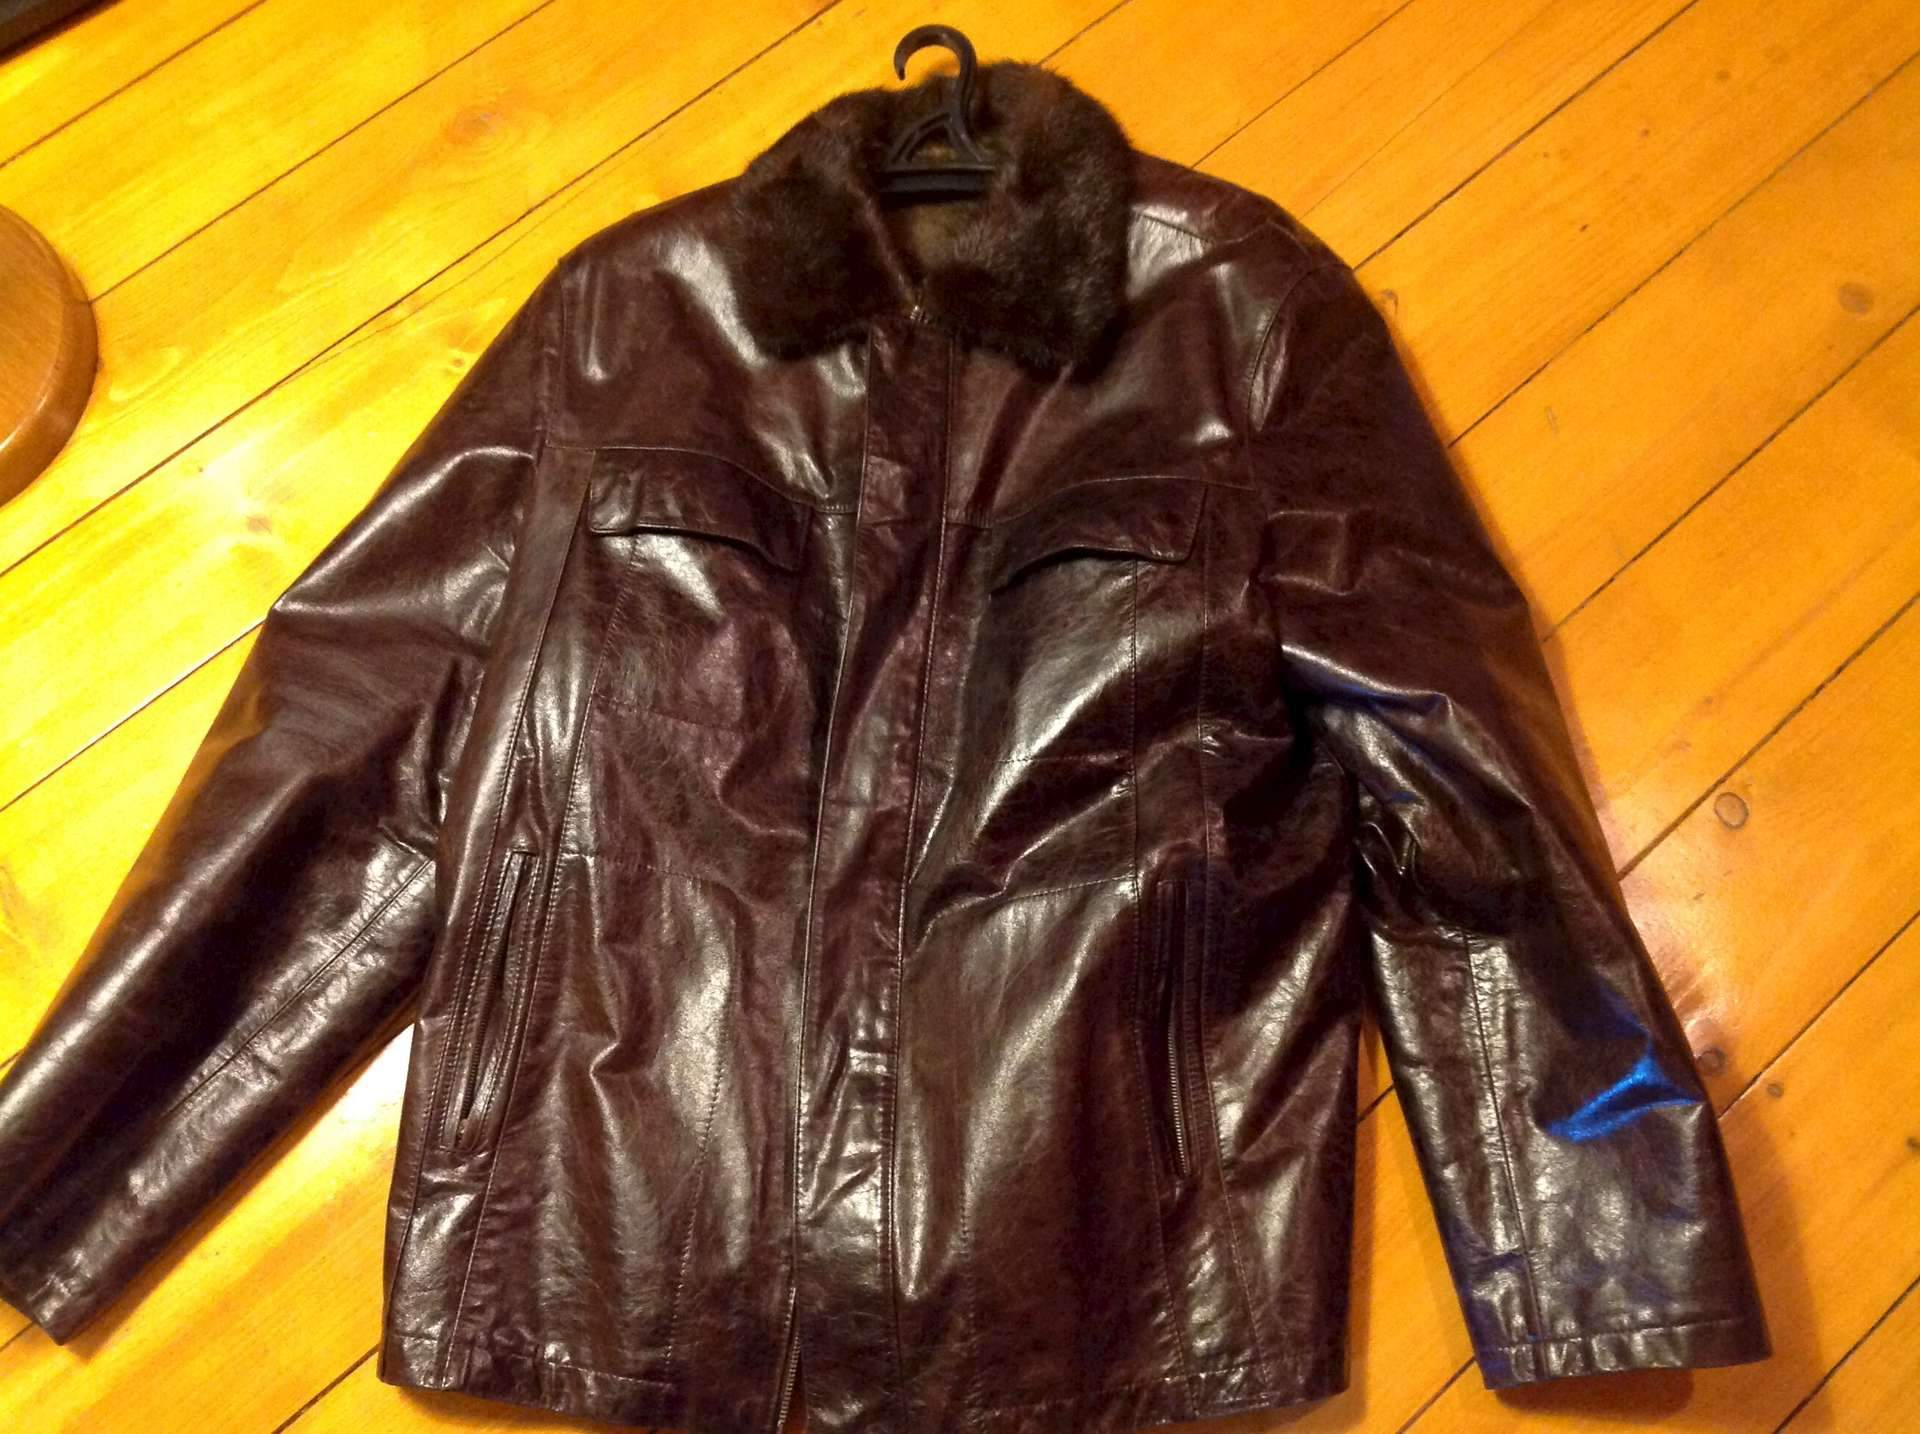 Купить Кожаную Зимнюю Куртку Цена